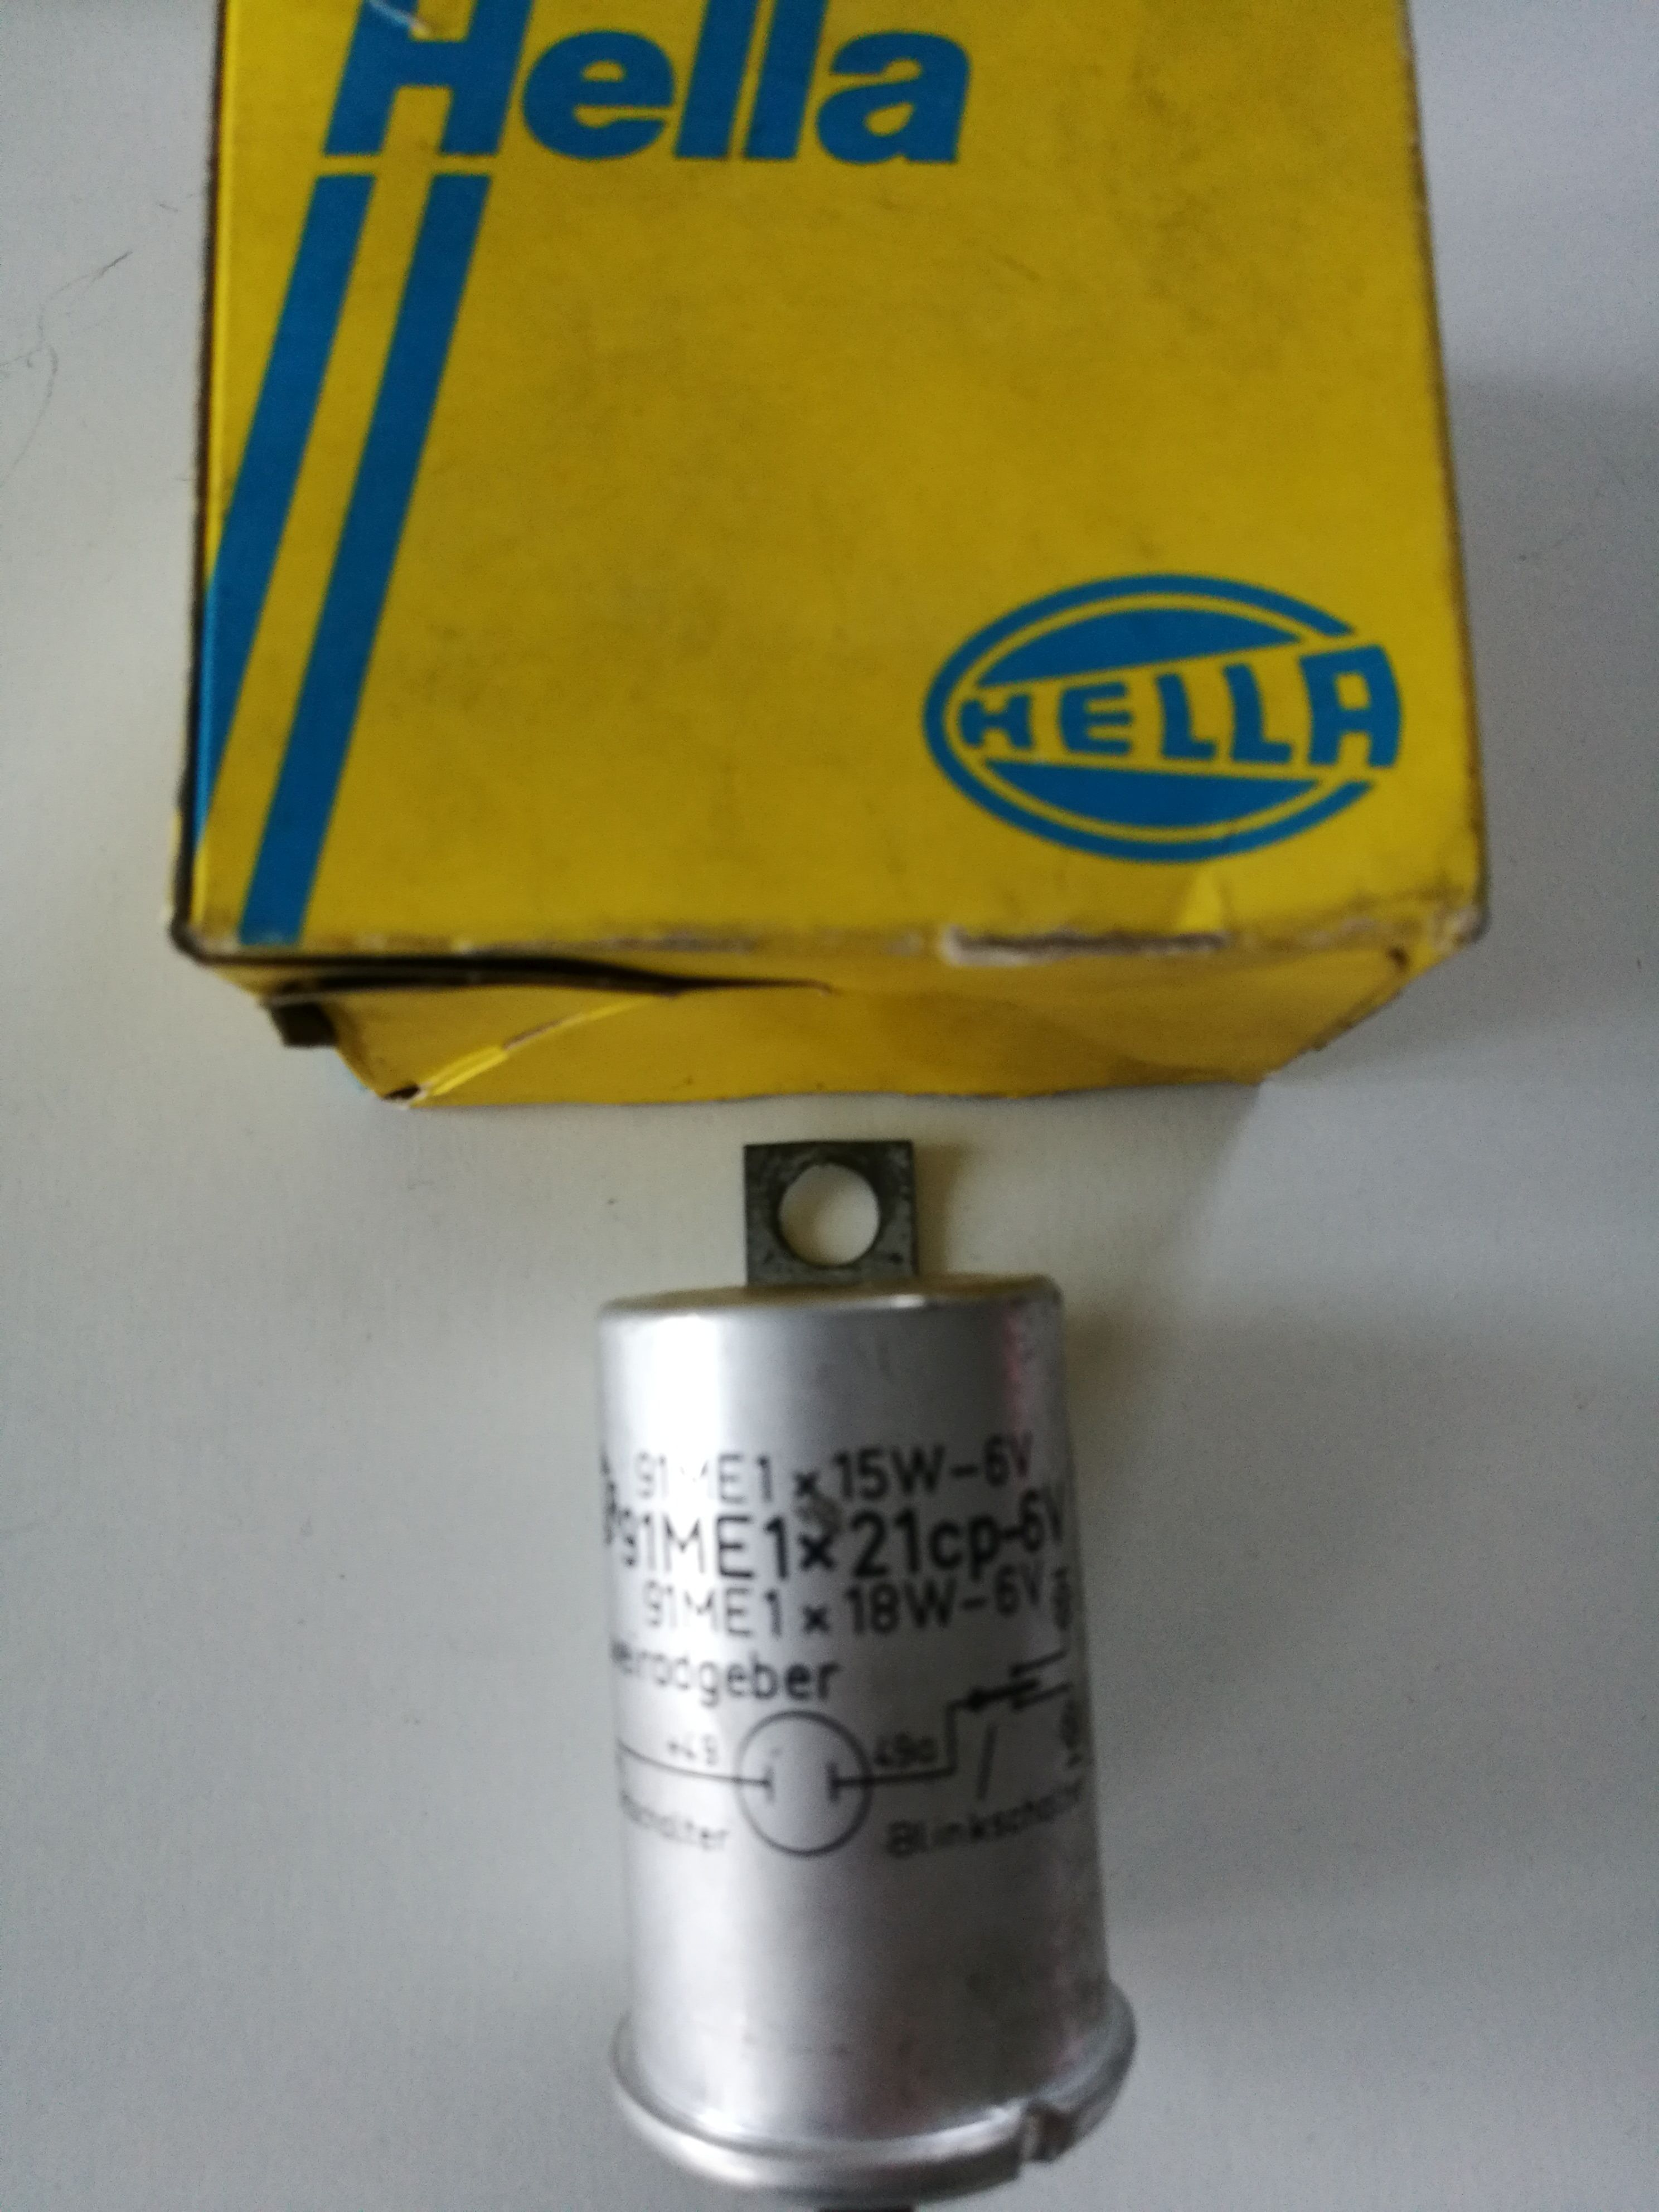 HELLA 4NM001820021 Blinkgeber 91ME 1x15W 18 6V  avertissement clignotant